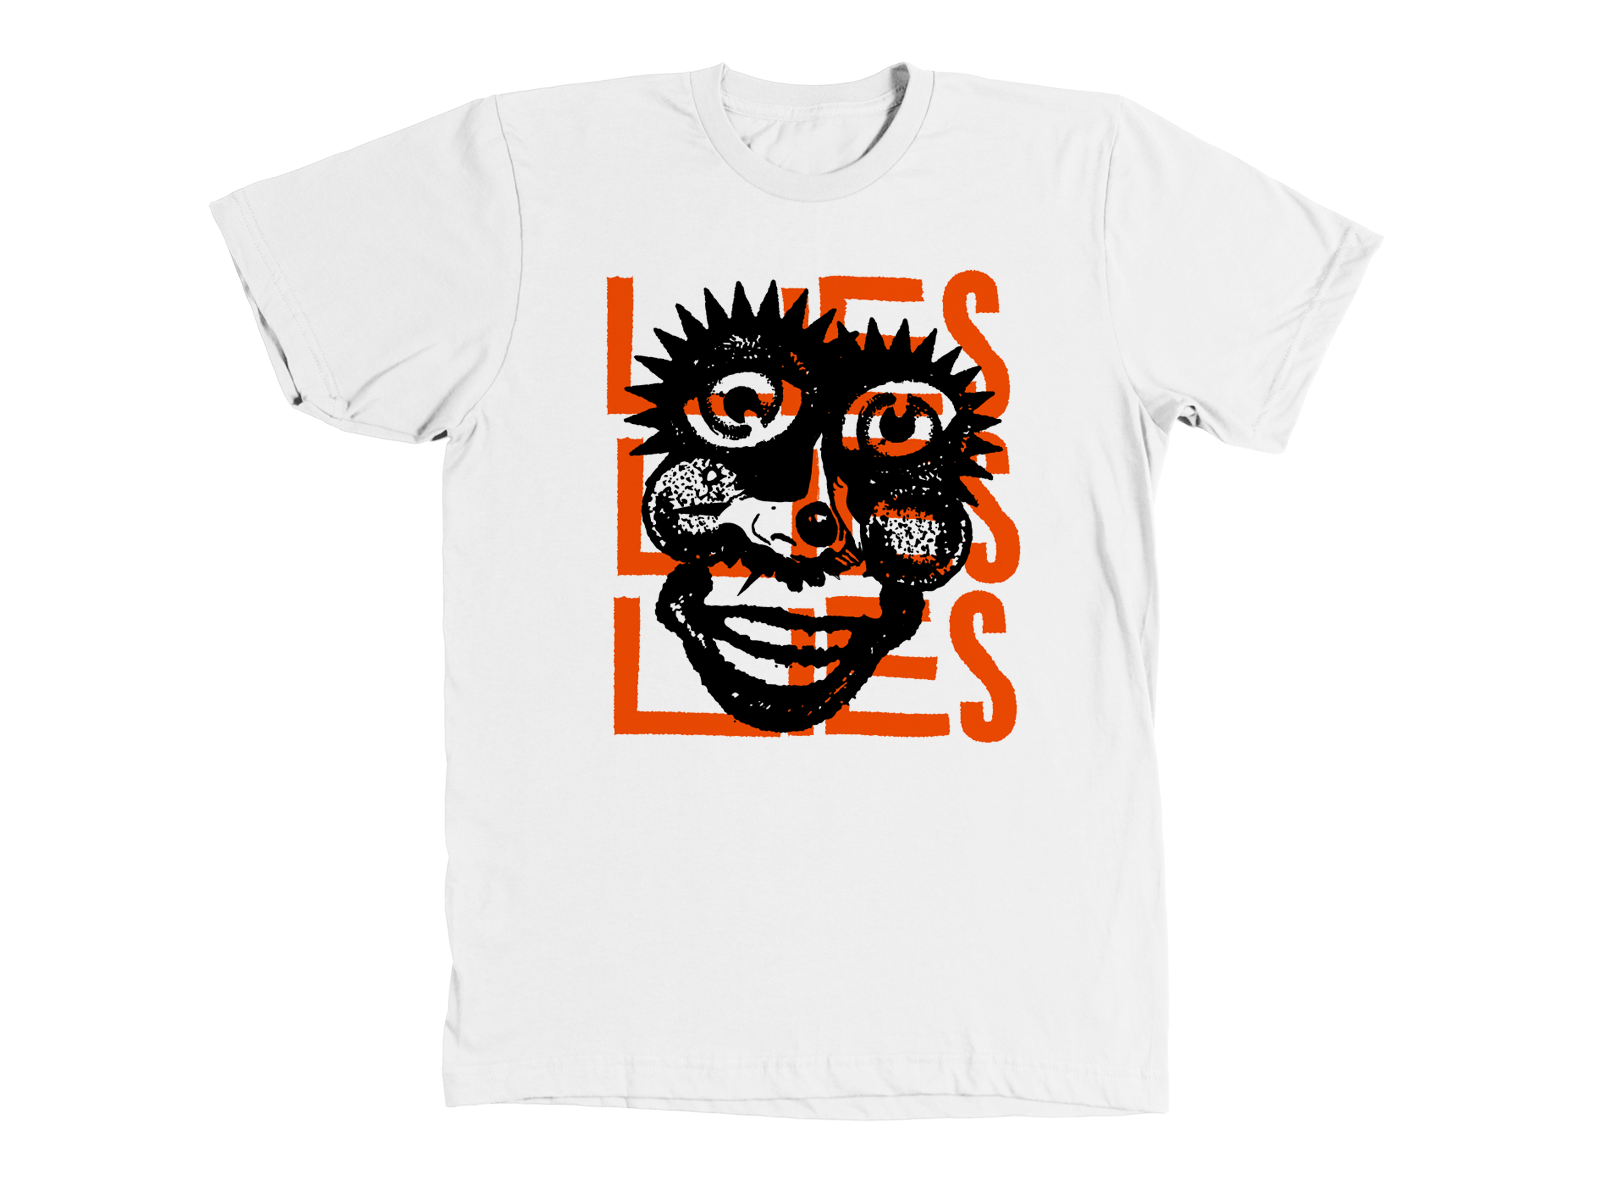 lies-shirt-2.png